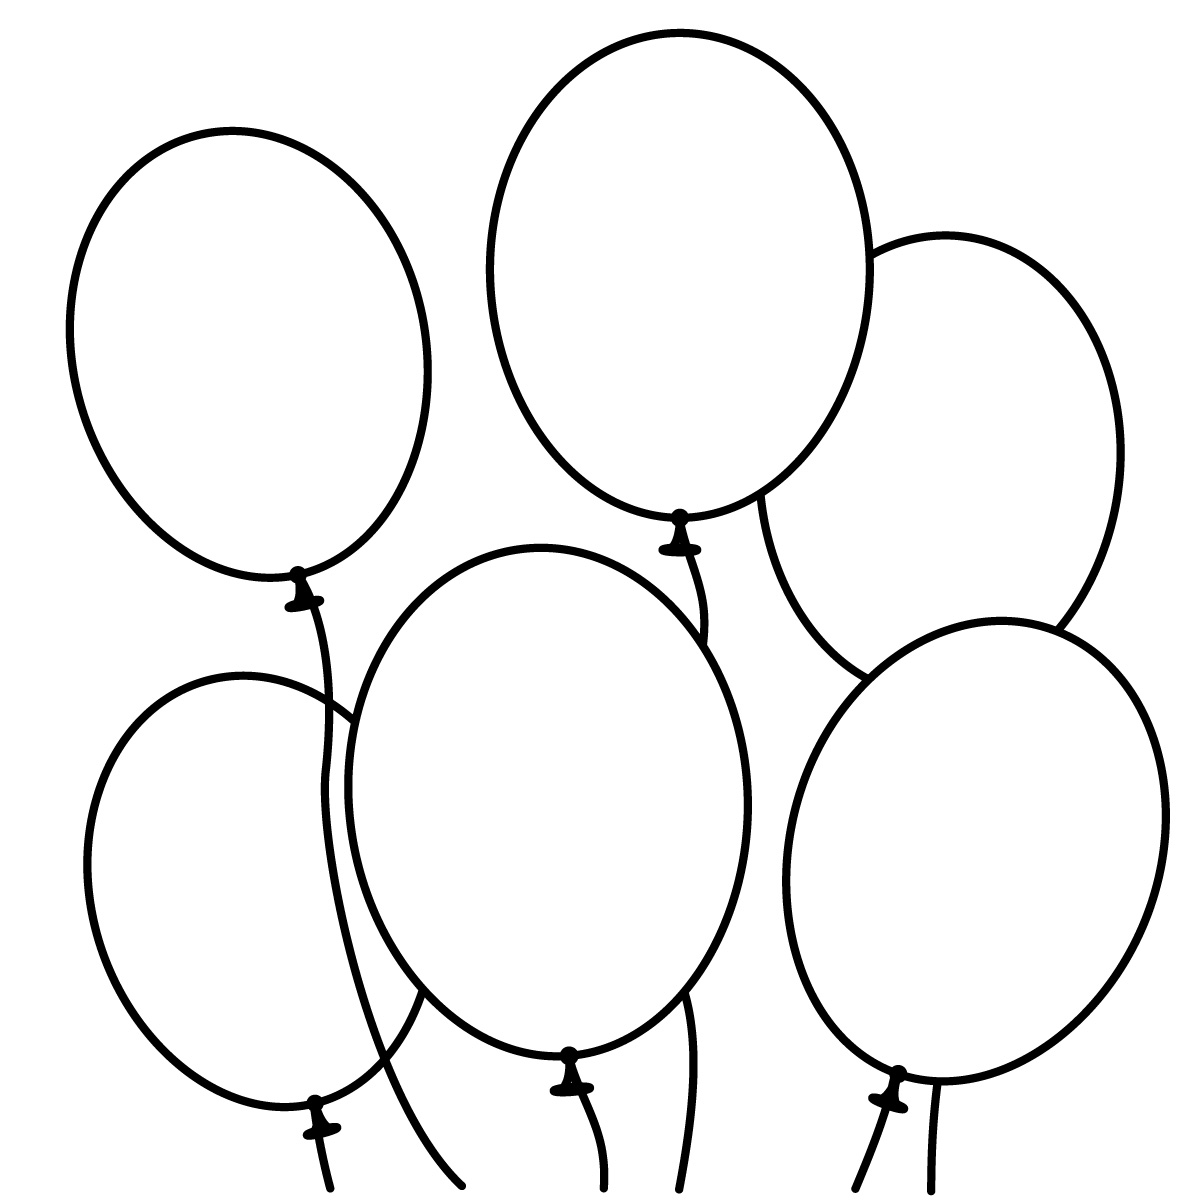 Balloon shapes clipart clip Free Balloon Outline, Download Free Clip Art, Free Clip Art on ... clip